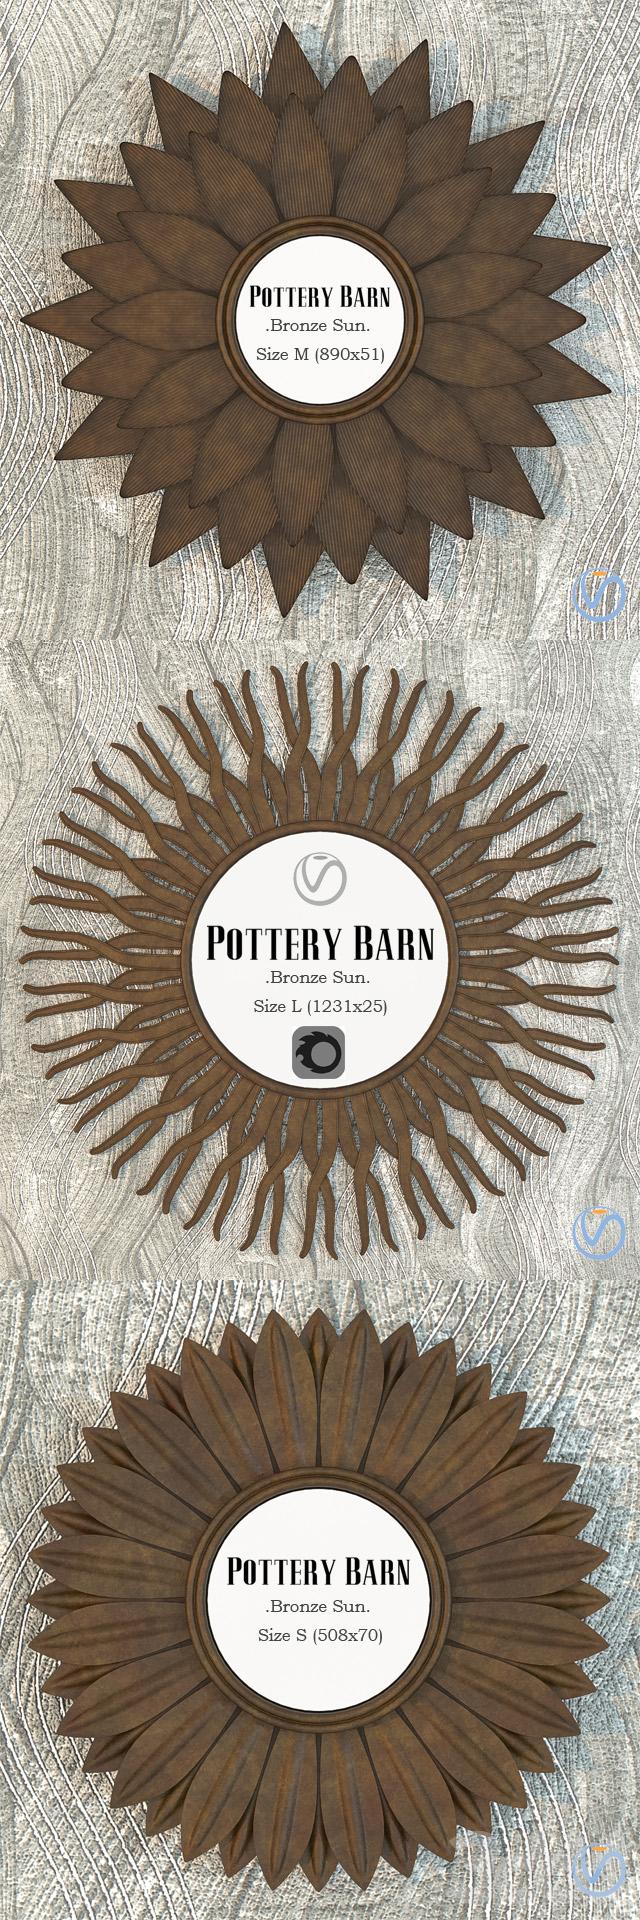 Pottery Barn Bronze Sun Mirror set